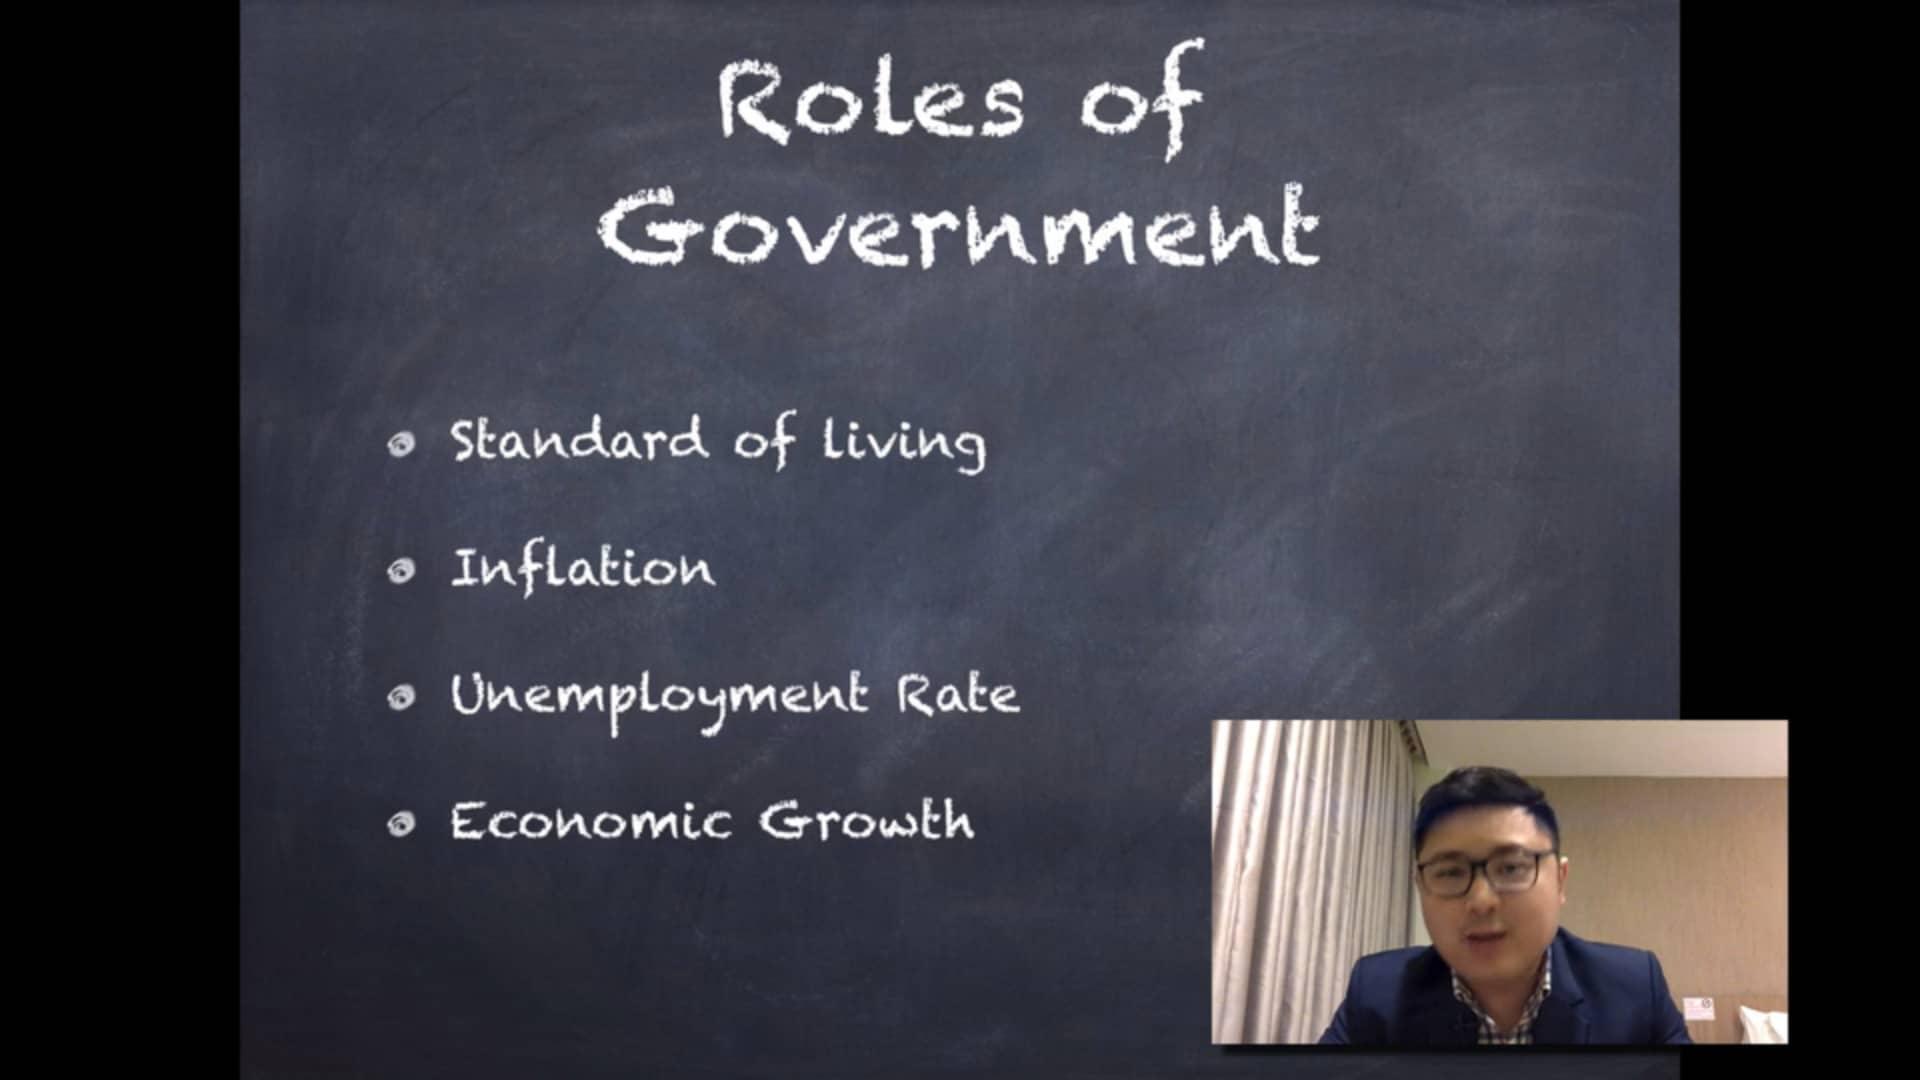 economics 6 Government role